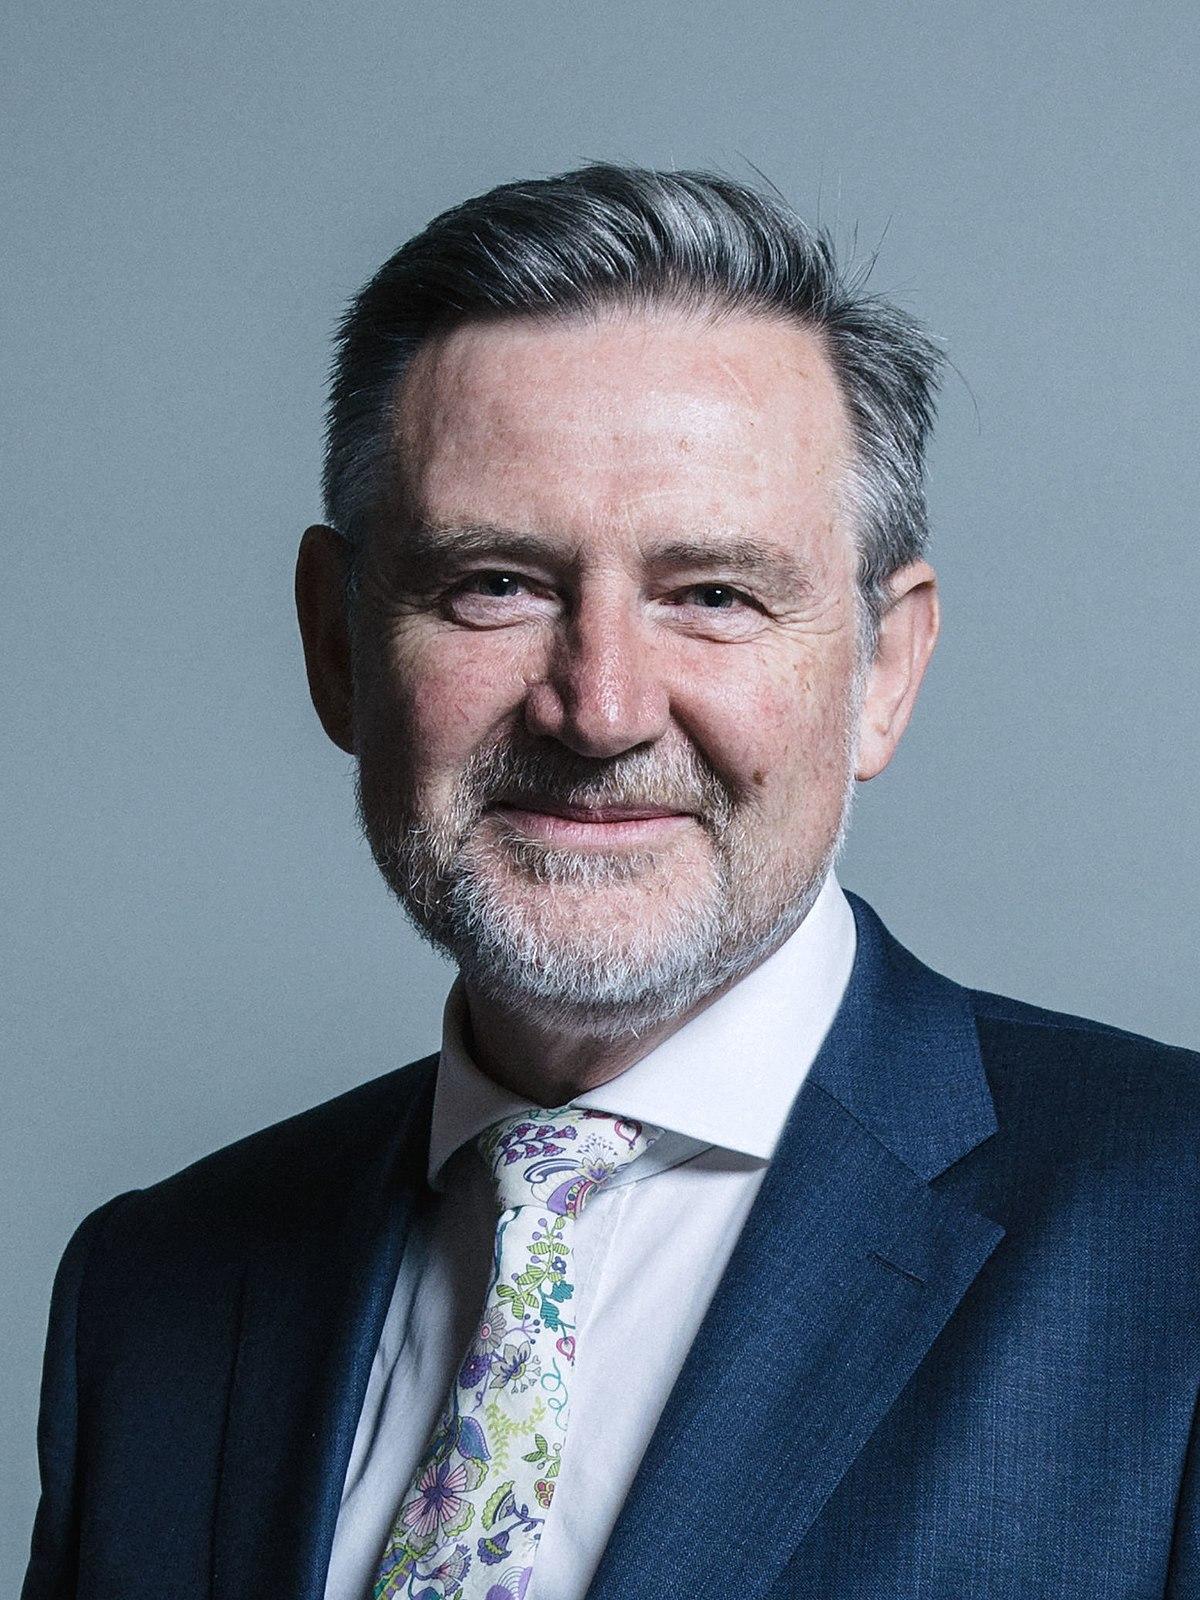 Tony Greenstein Blog: Tony Greenstein's Blog: More Fake Anti-Semitism As MPs